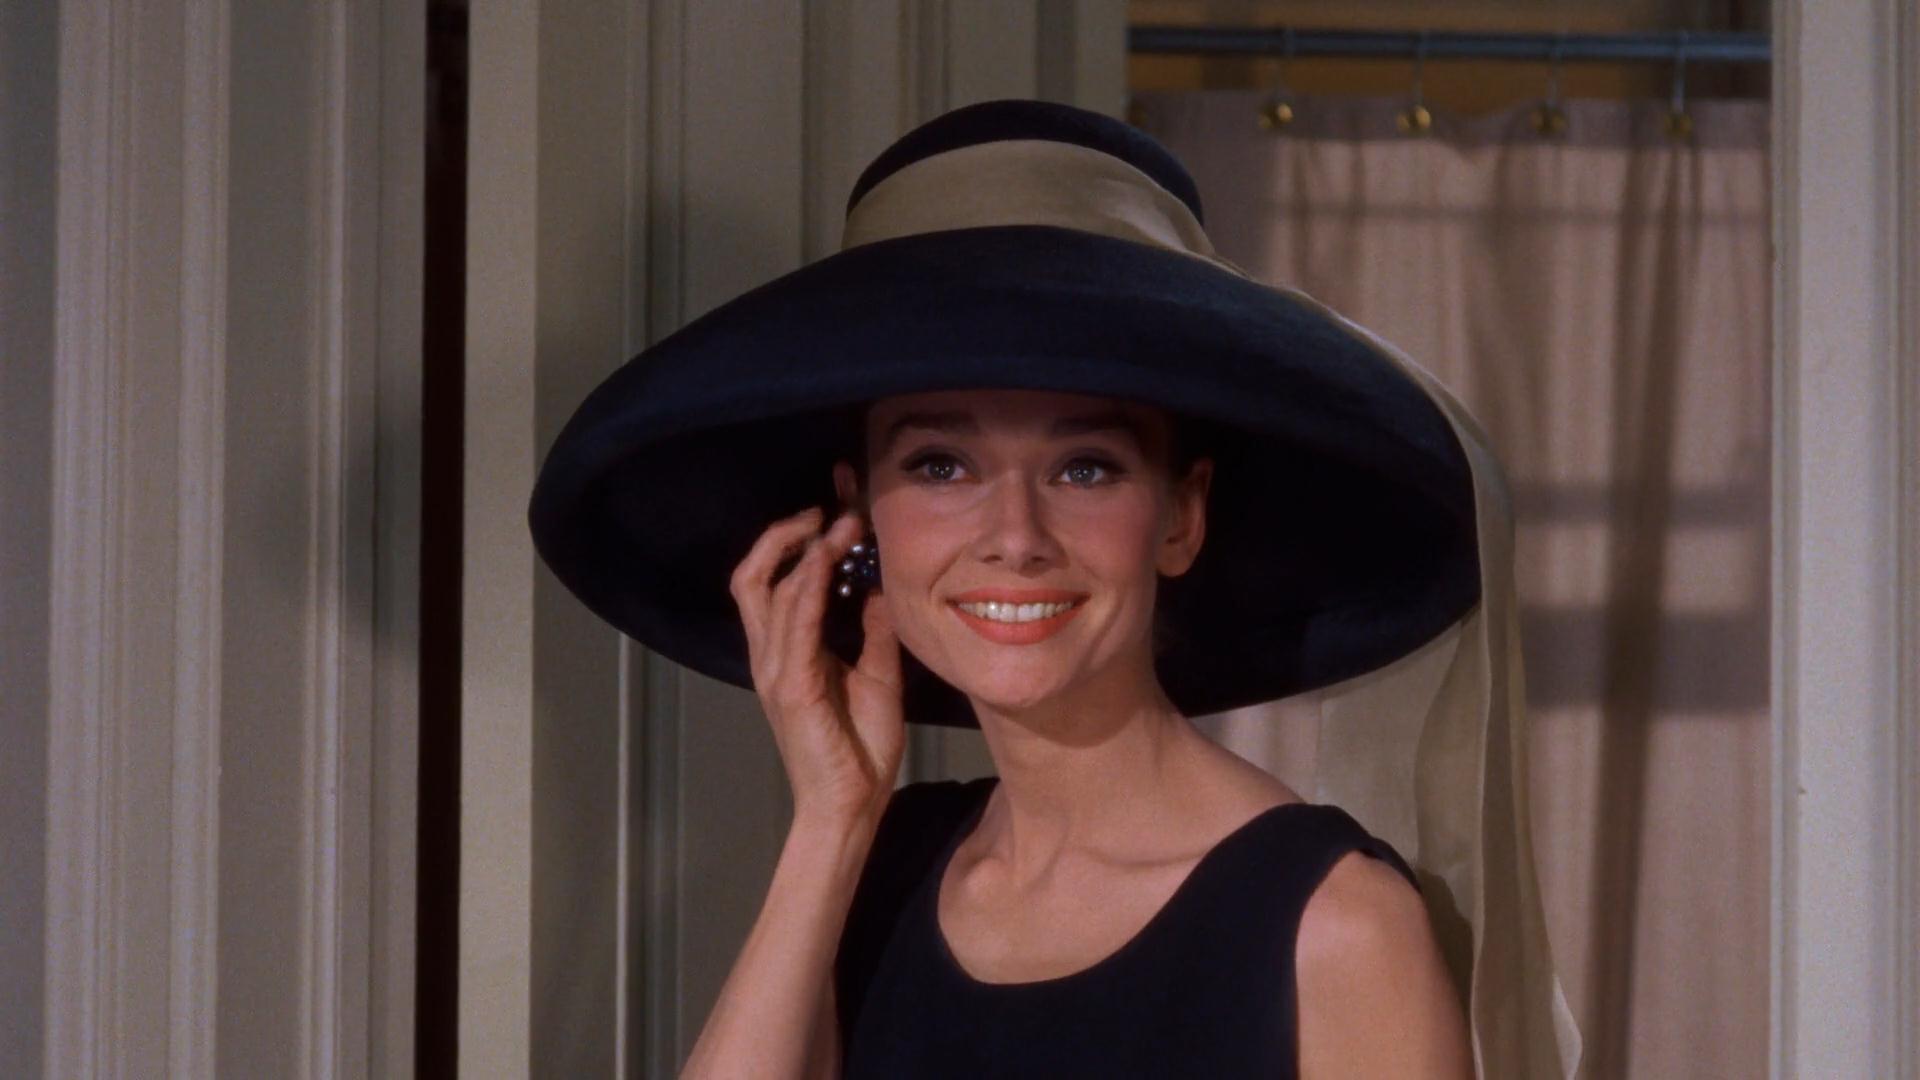 Breakfast at Tiffany's Audrey Hepburn as Holly Golightly